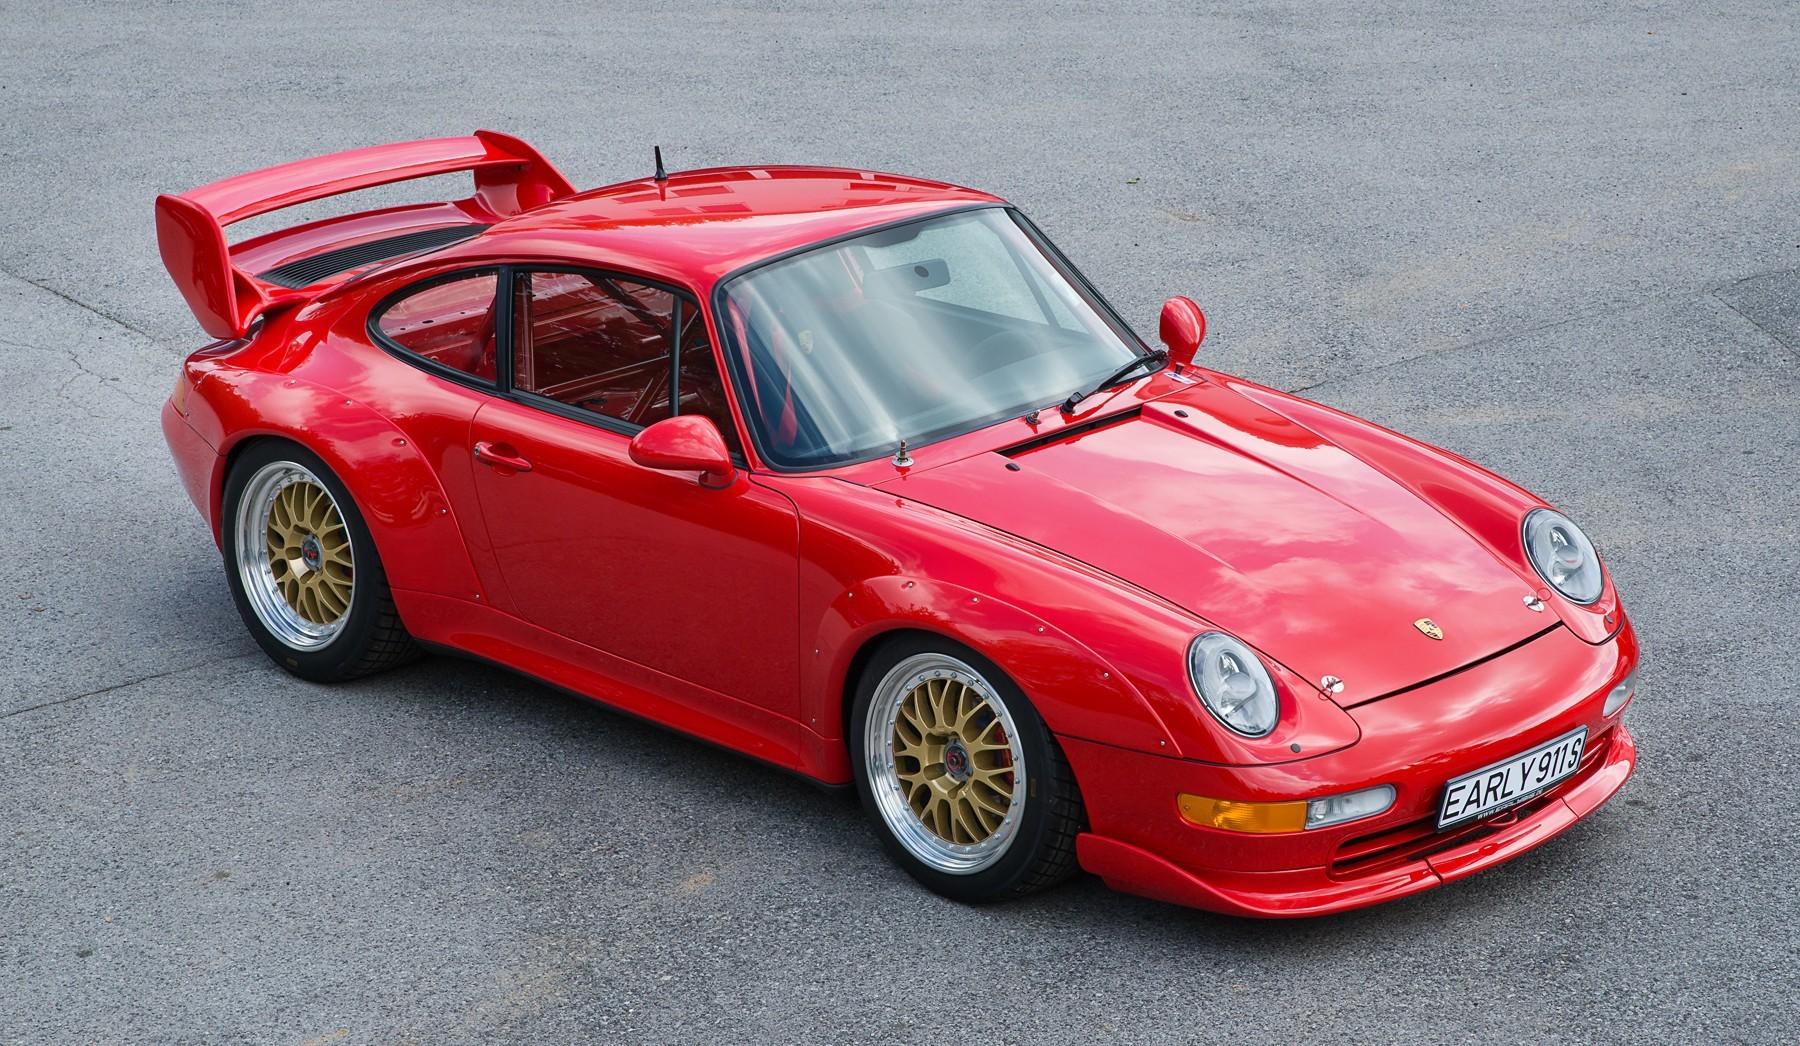 Porsche 993 Cup 3.8 RSR